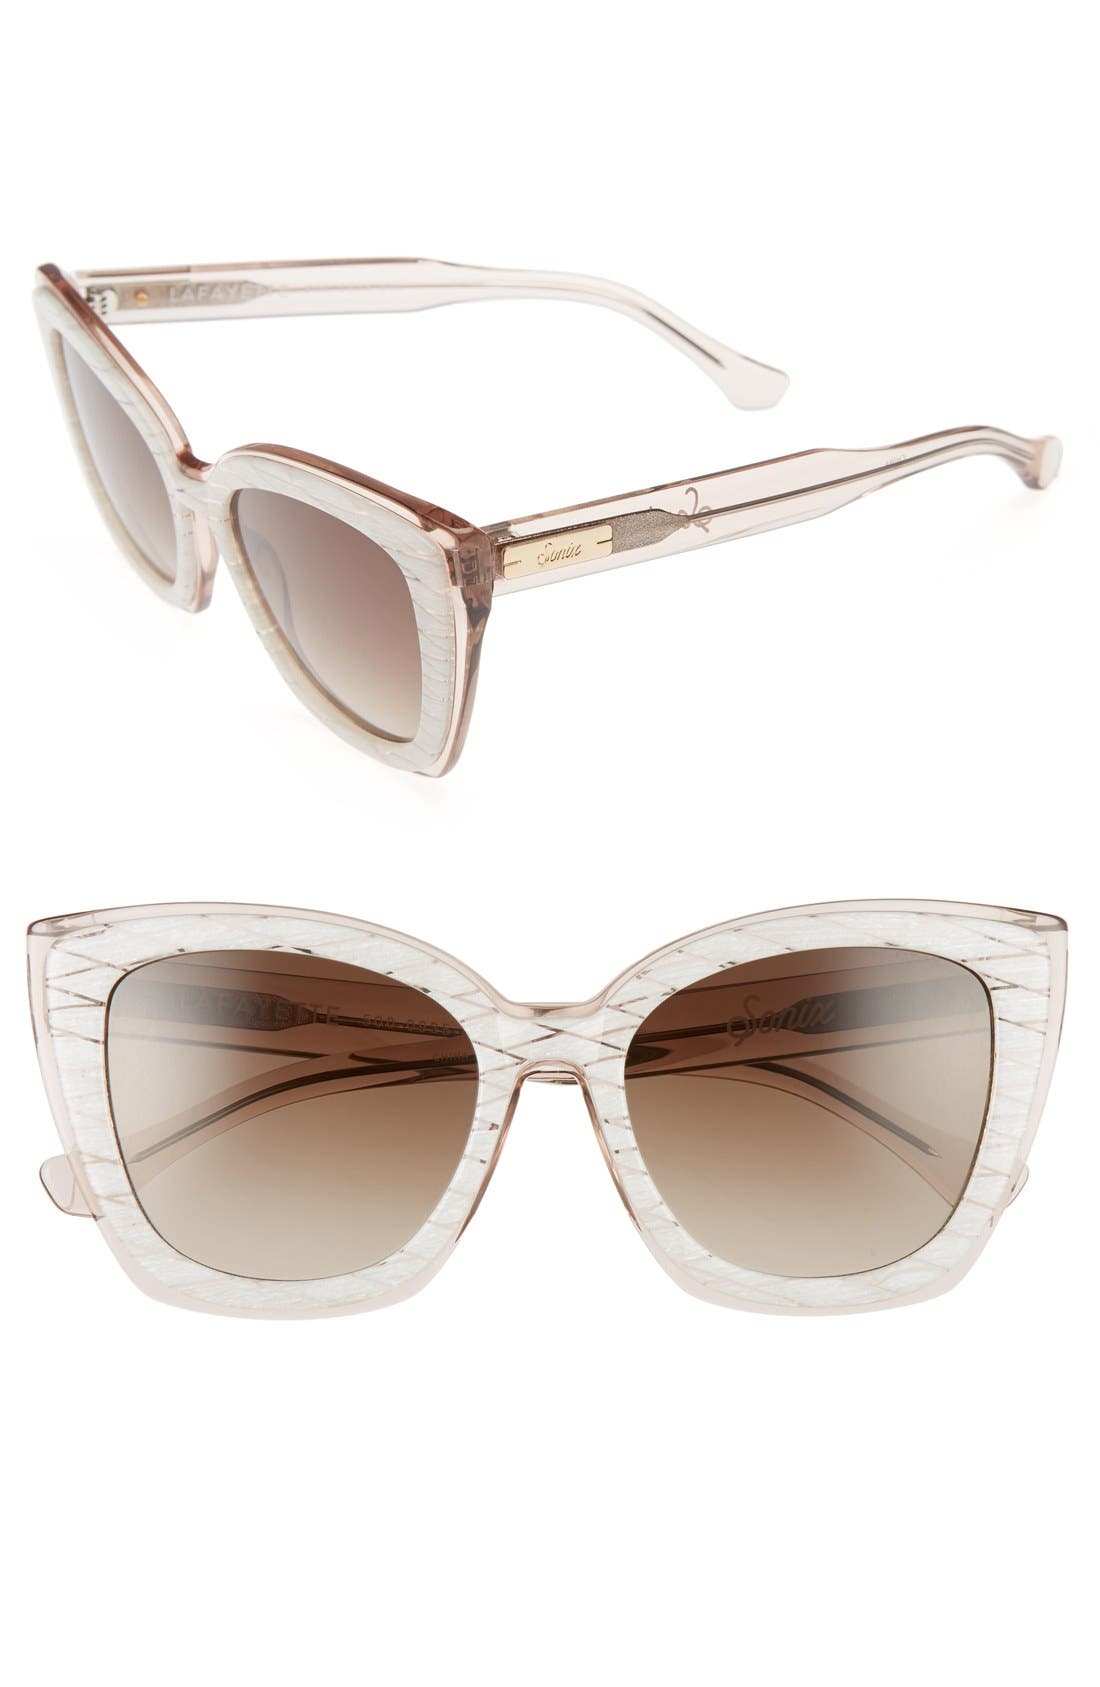 Sonix Lafayette 53mm Gradient Cat Eye Sunglasses